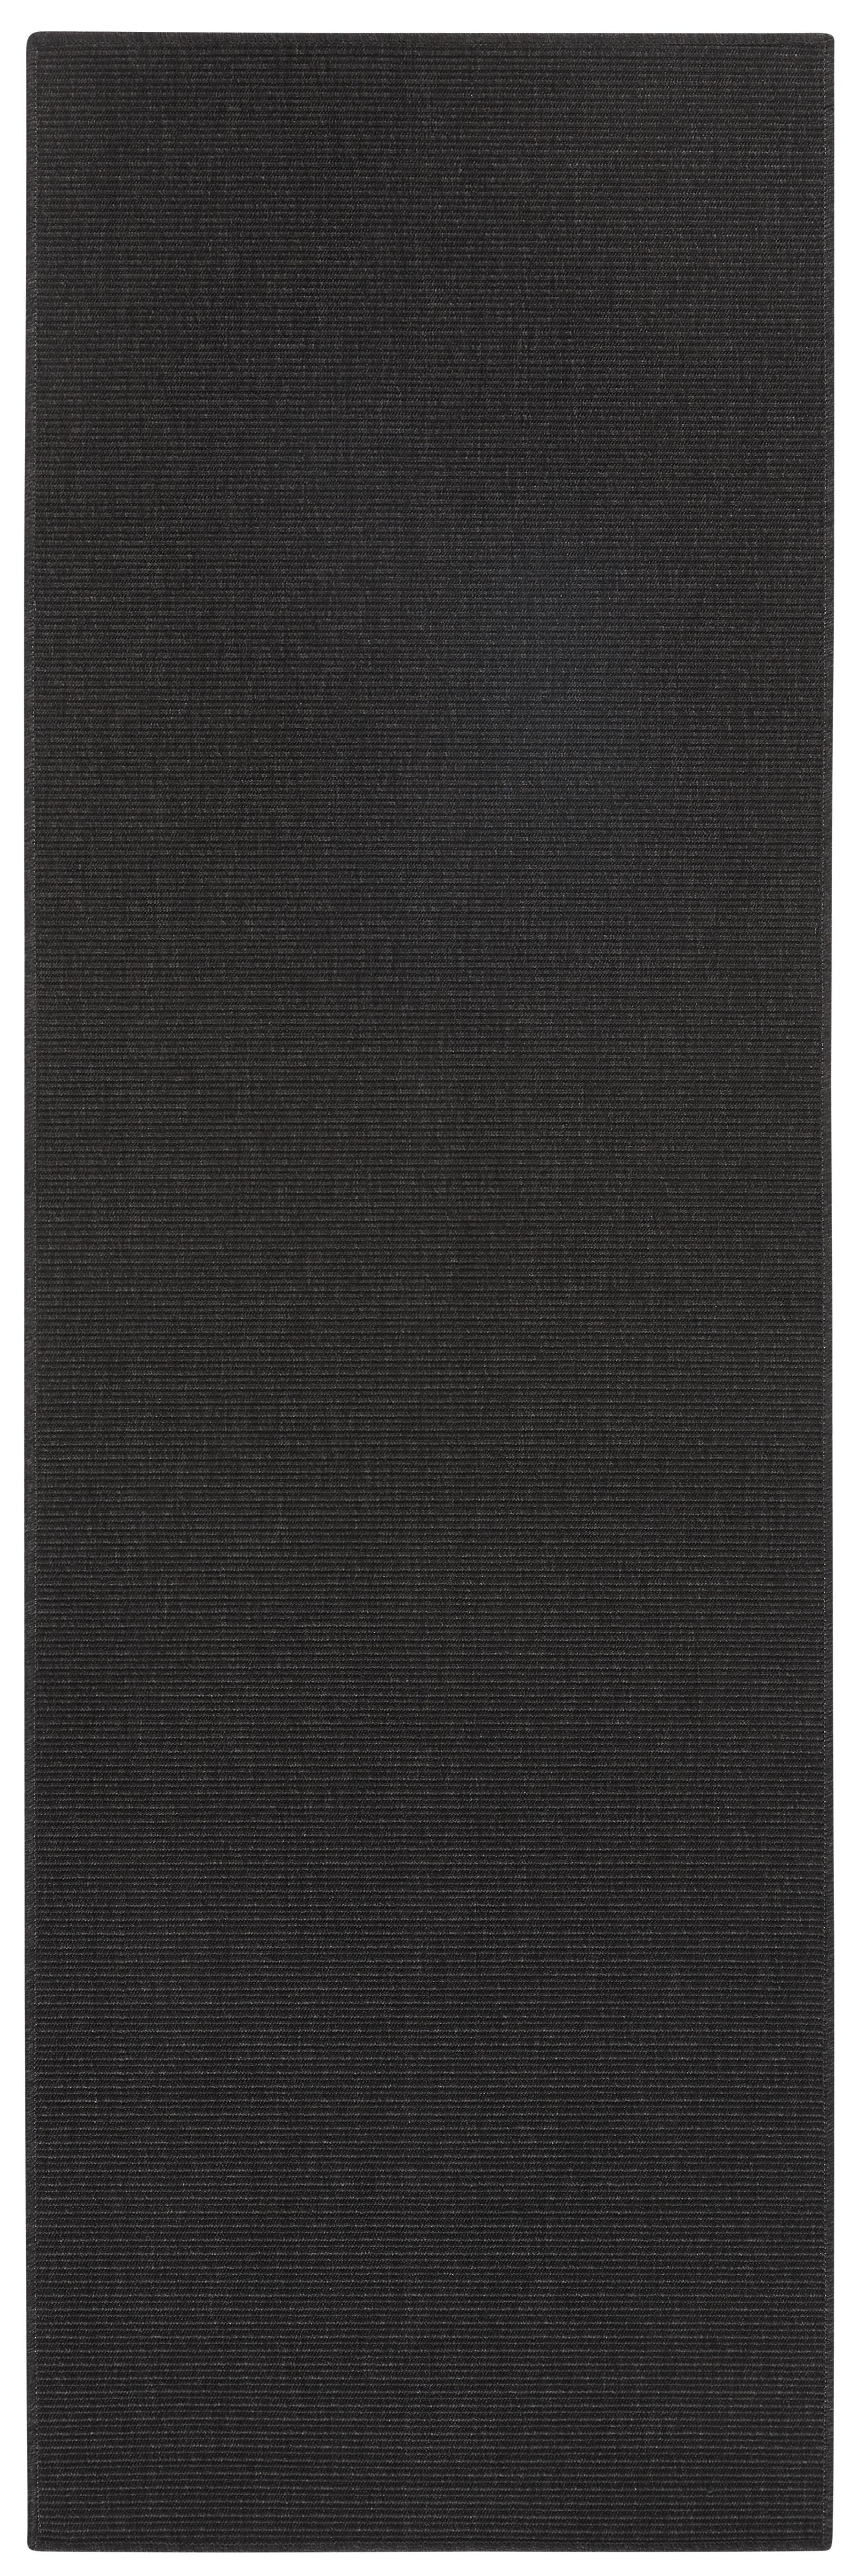 BT Carpet - Hanse Home koberce Běhoun Nature 103534 Black - 80x250 cm